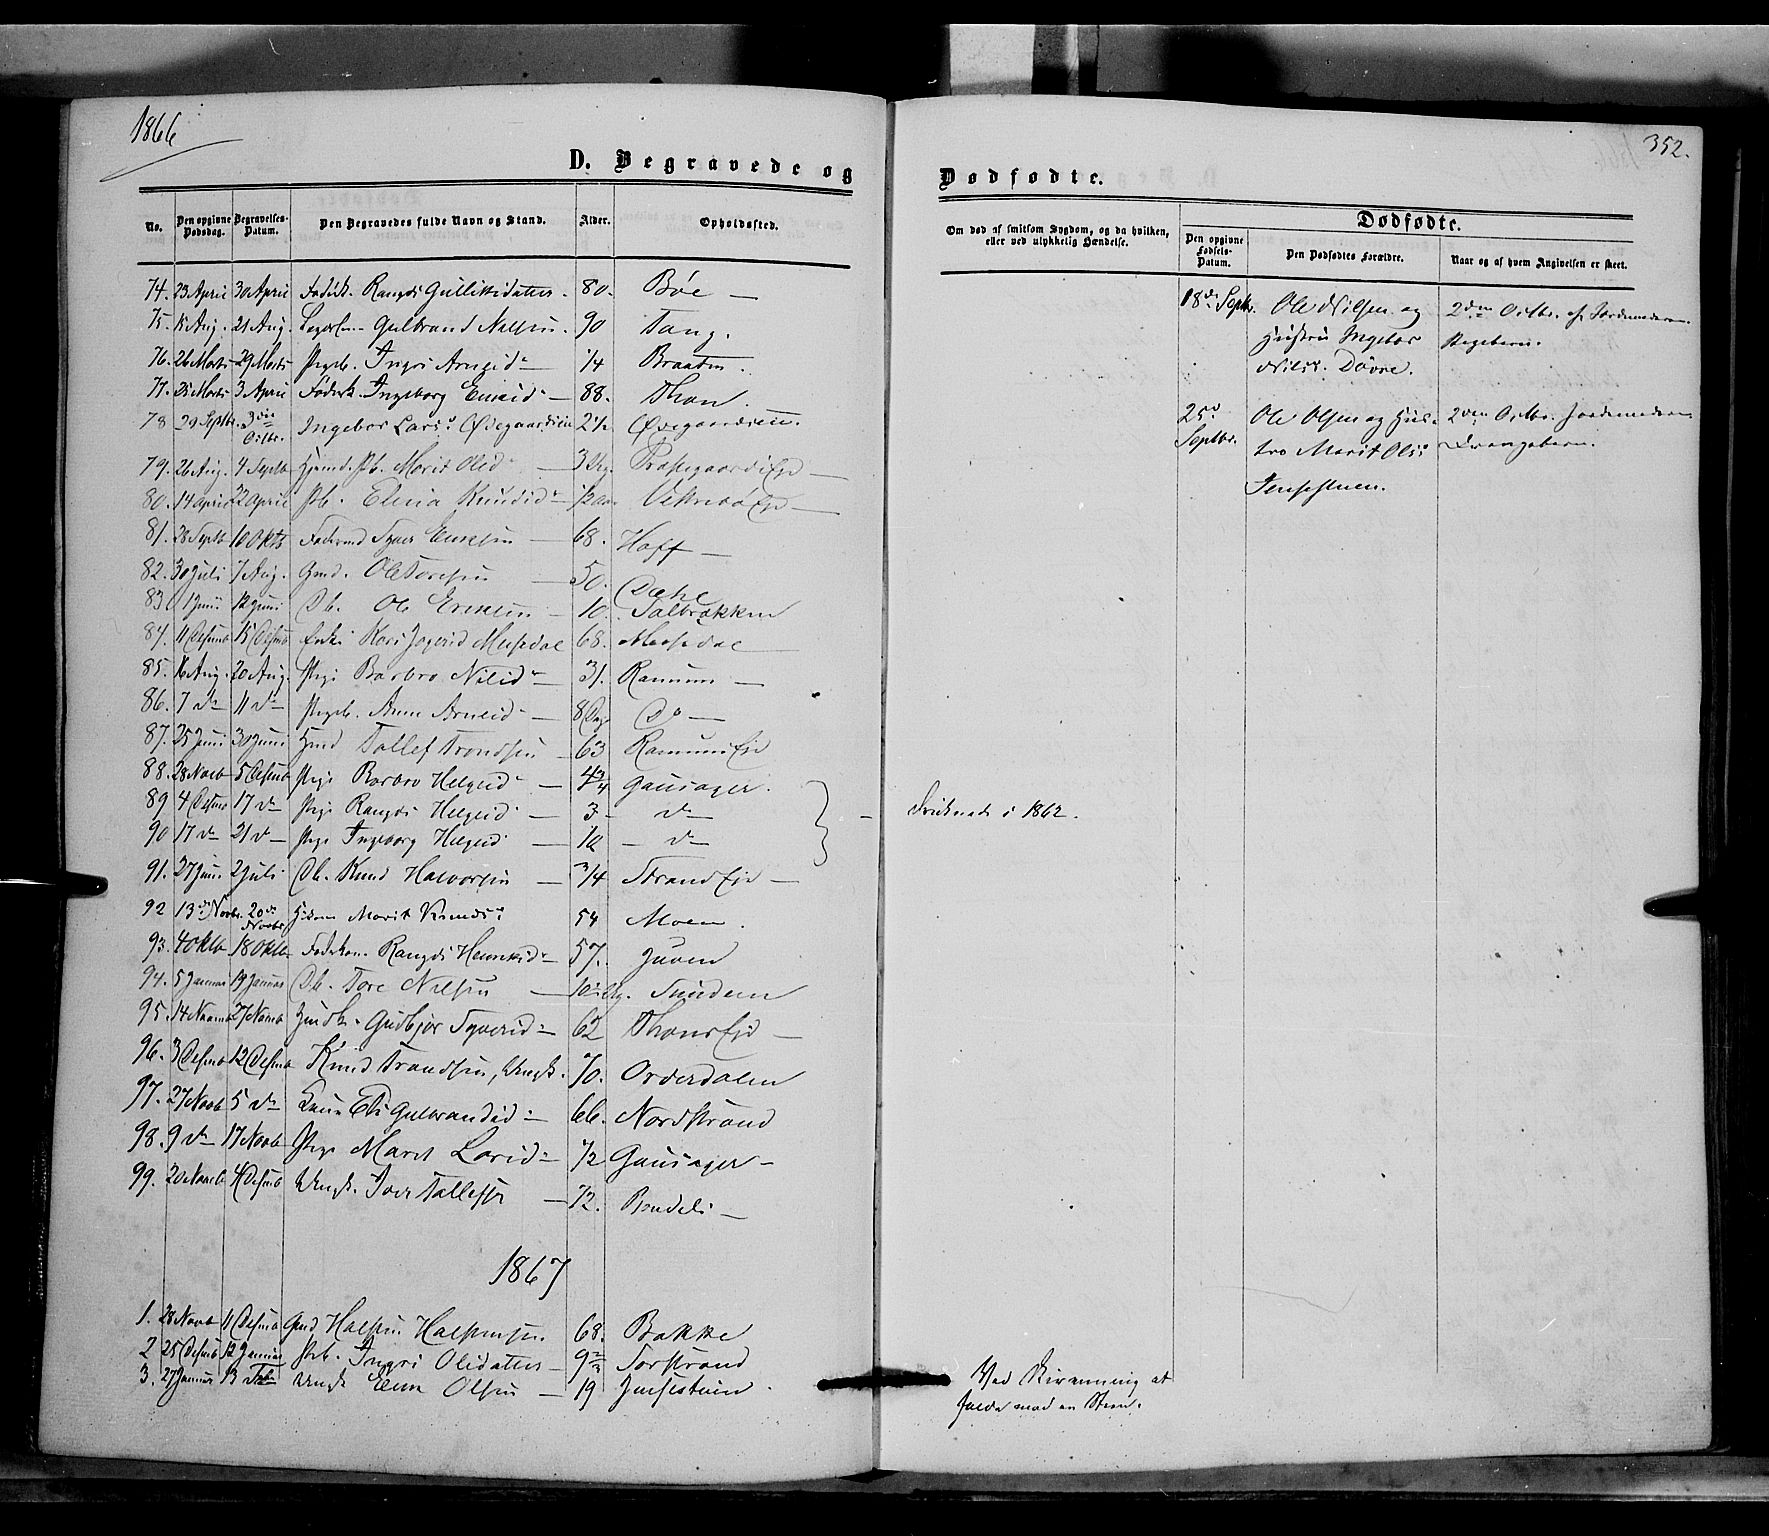 SAH, Nord-Aurdal prestekontor, Ministerialbok nr. 8, 1863-1875, s. 352